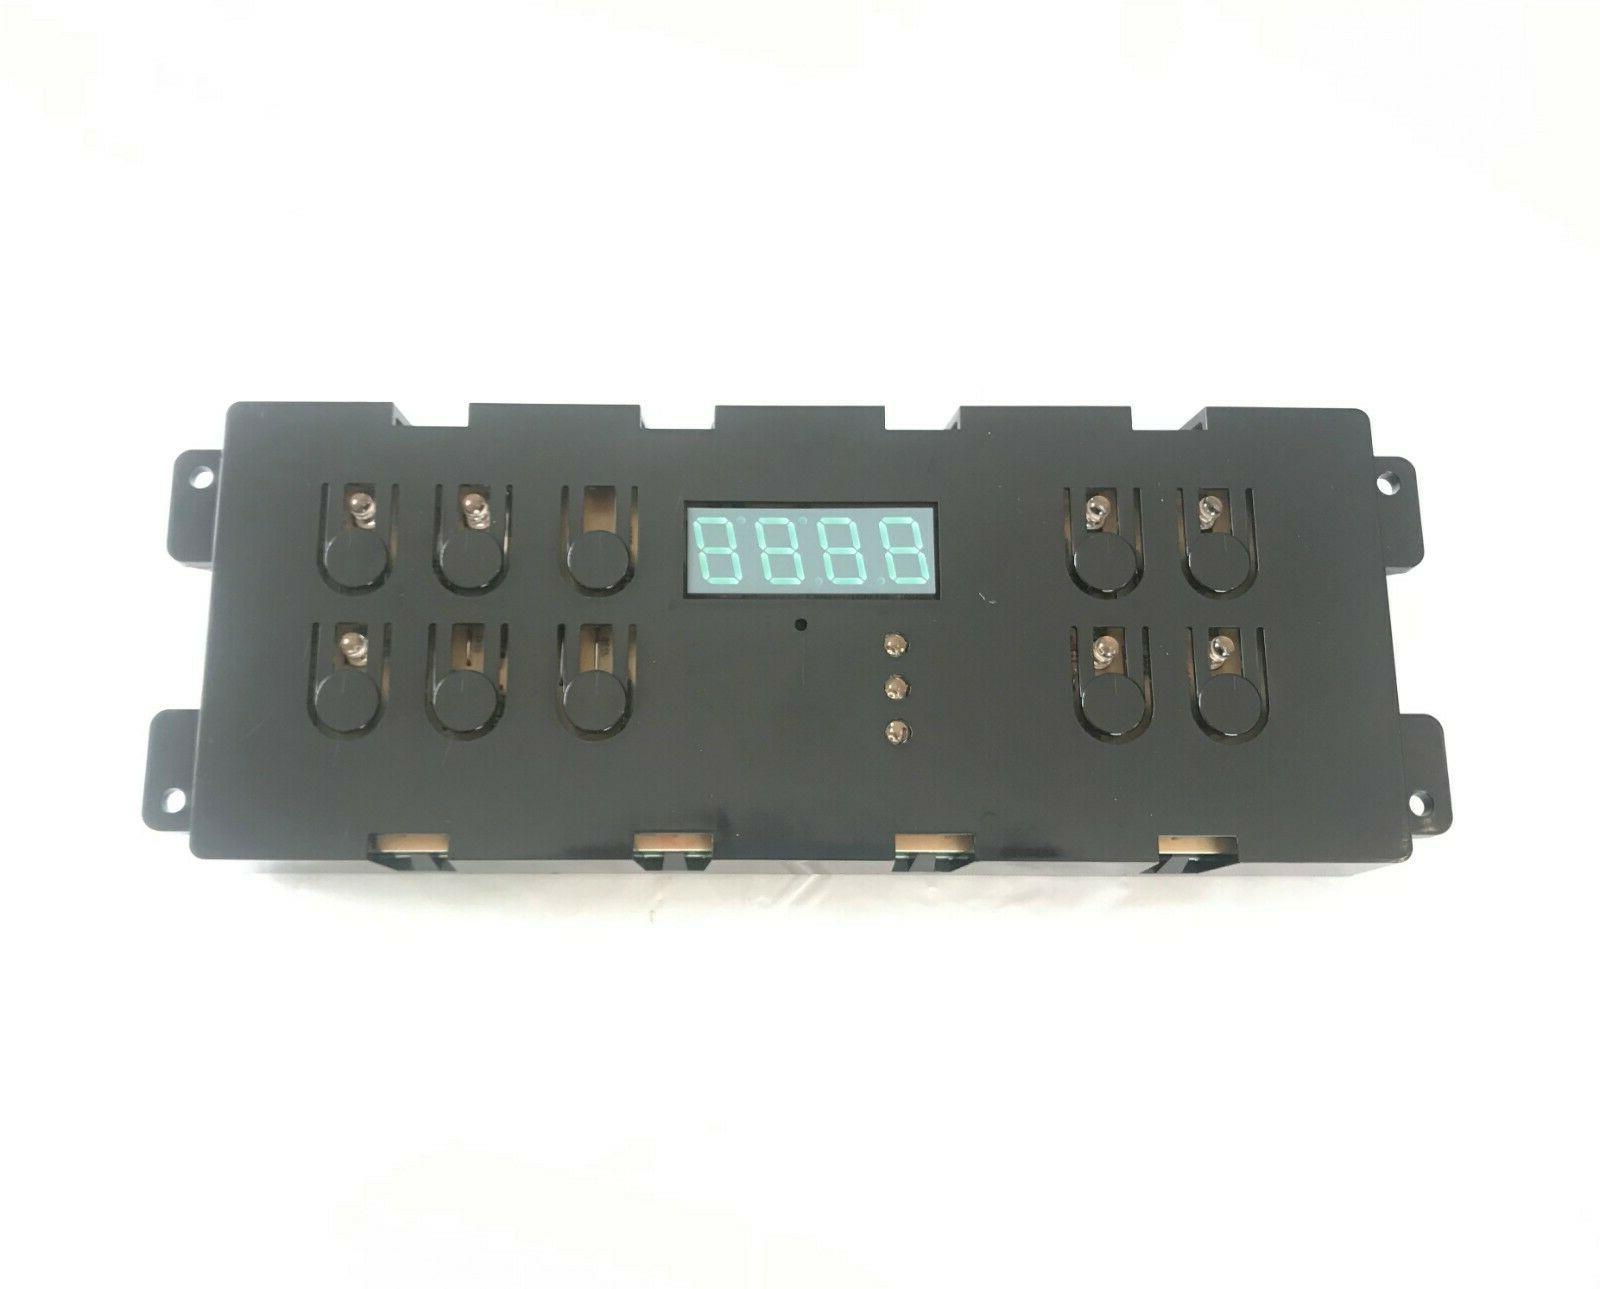 Genuine OEM Frigidaire 316557115 Oven Control Board 53045094